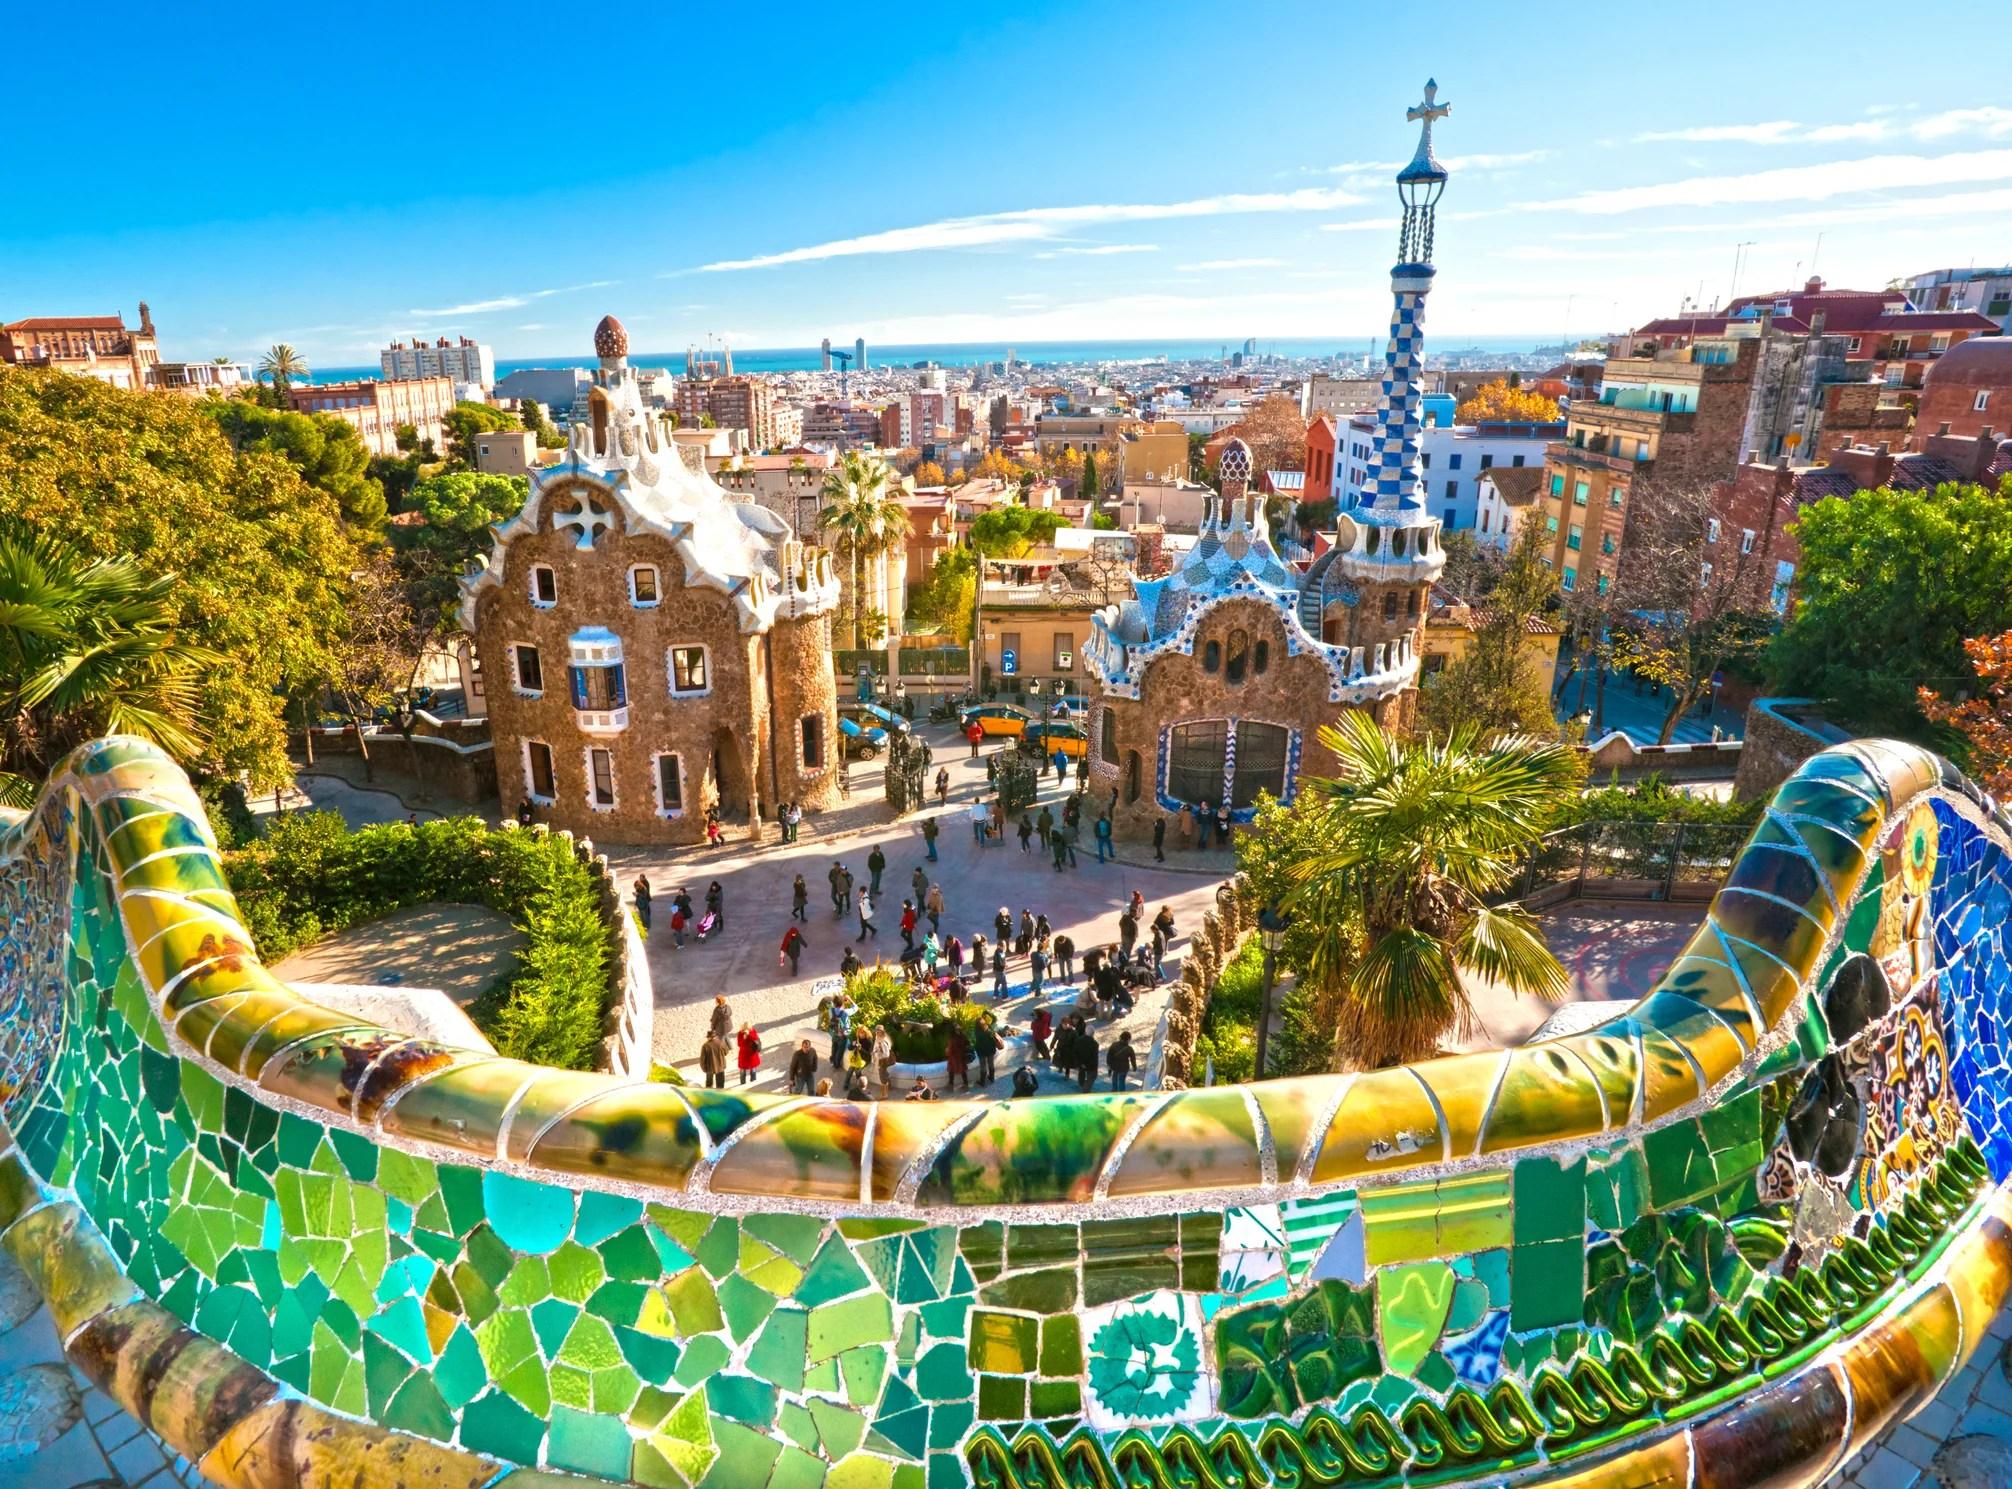 Deal Alert: Flights to Spain From $237 Round-Trip